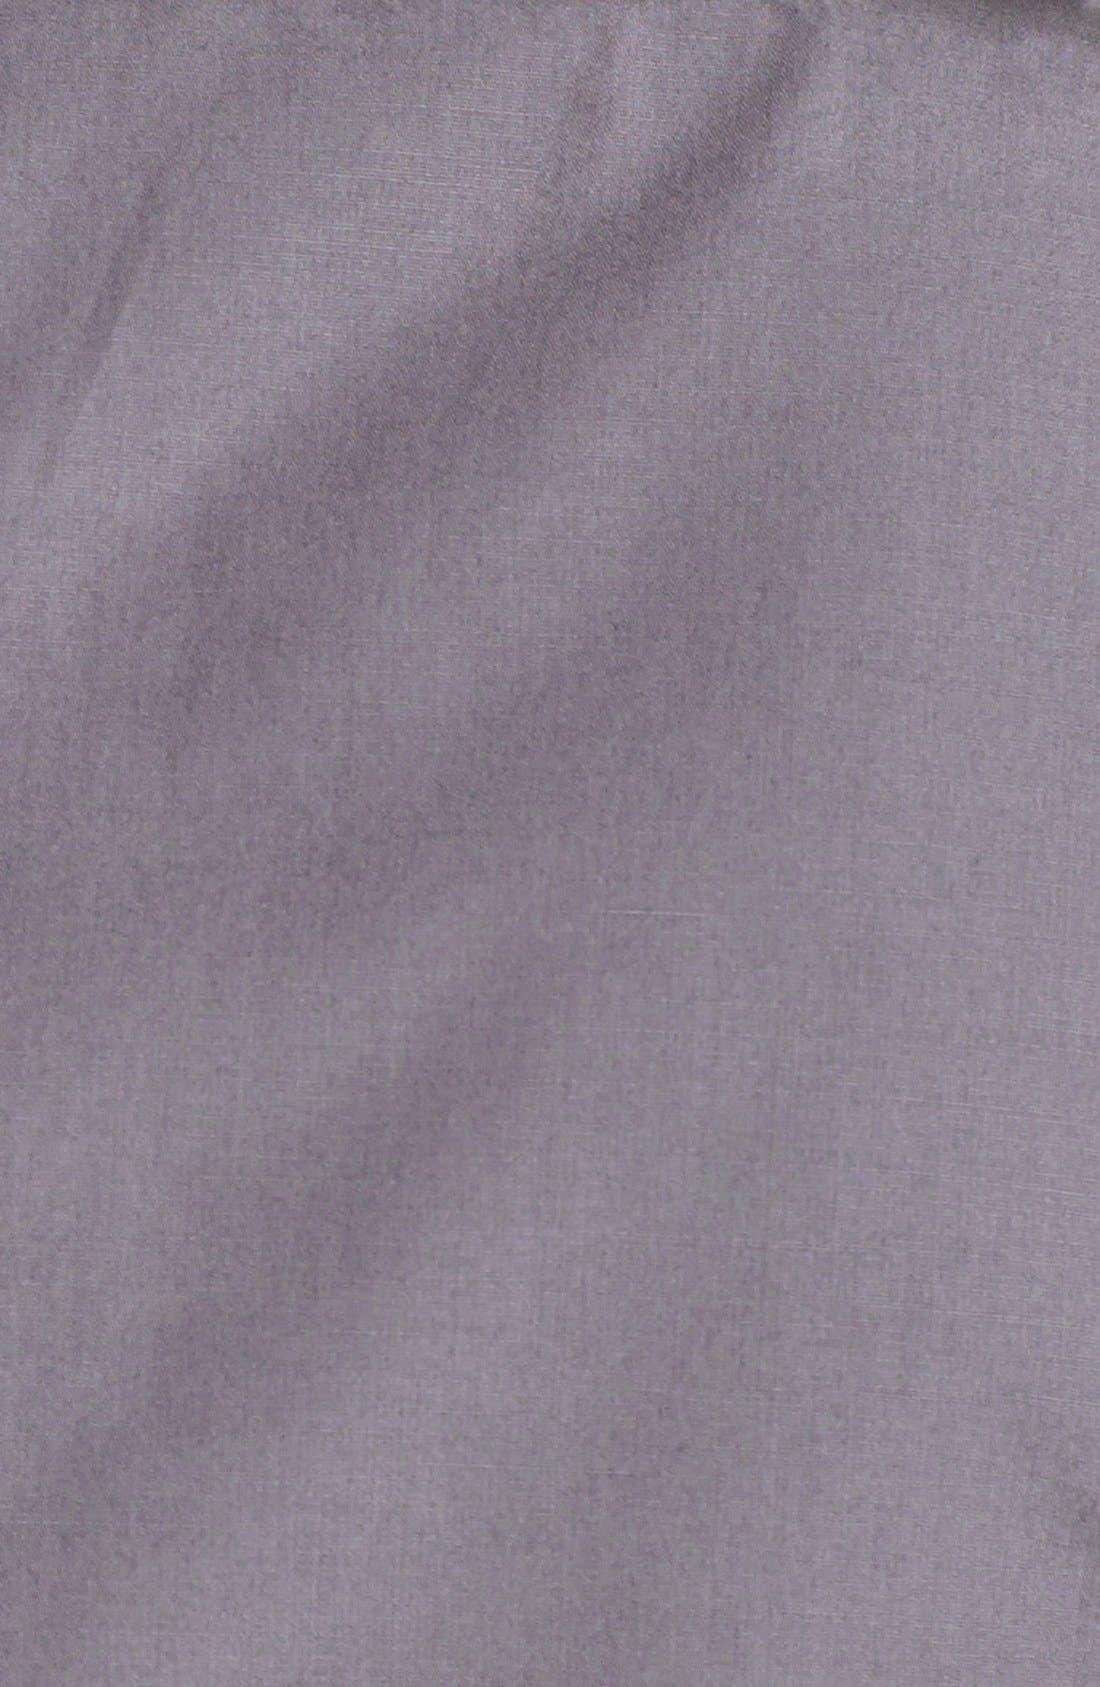 Alternate Image 3  - Dolce&Gabbana Tuxedo Shirt